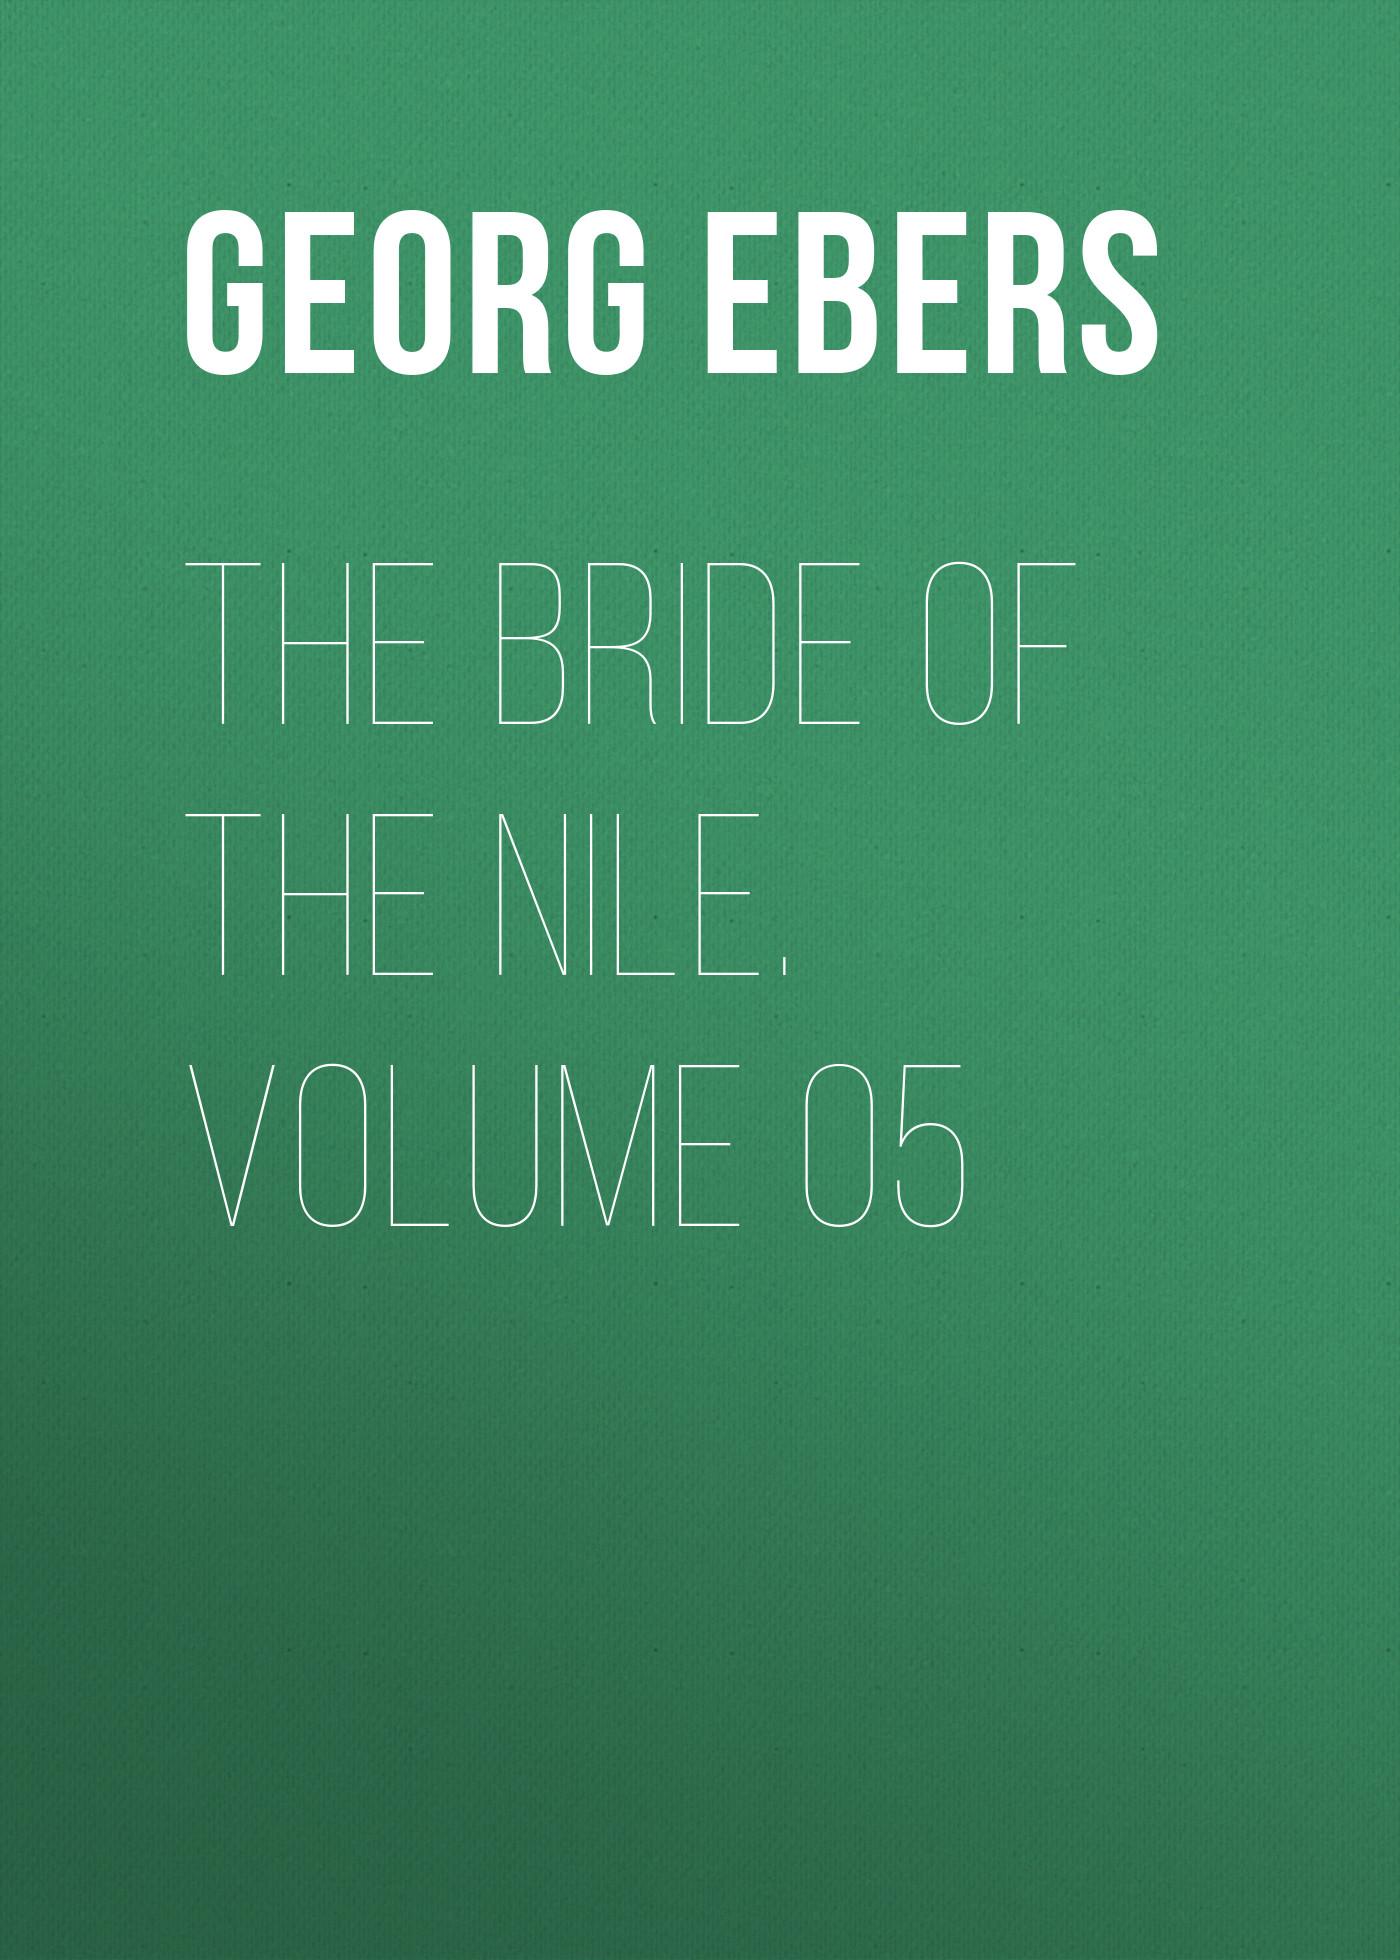 Georg Ebers The Bride of the Nile. Volume 05 gervinus georg gottfried the art of drinking